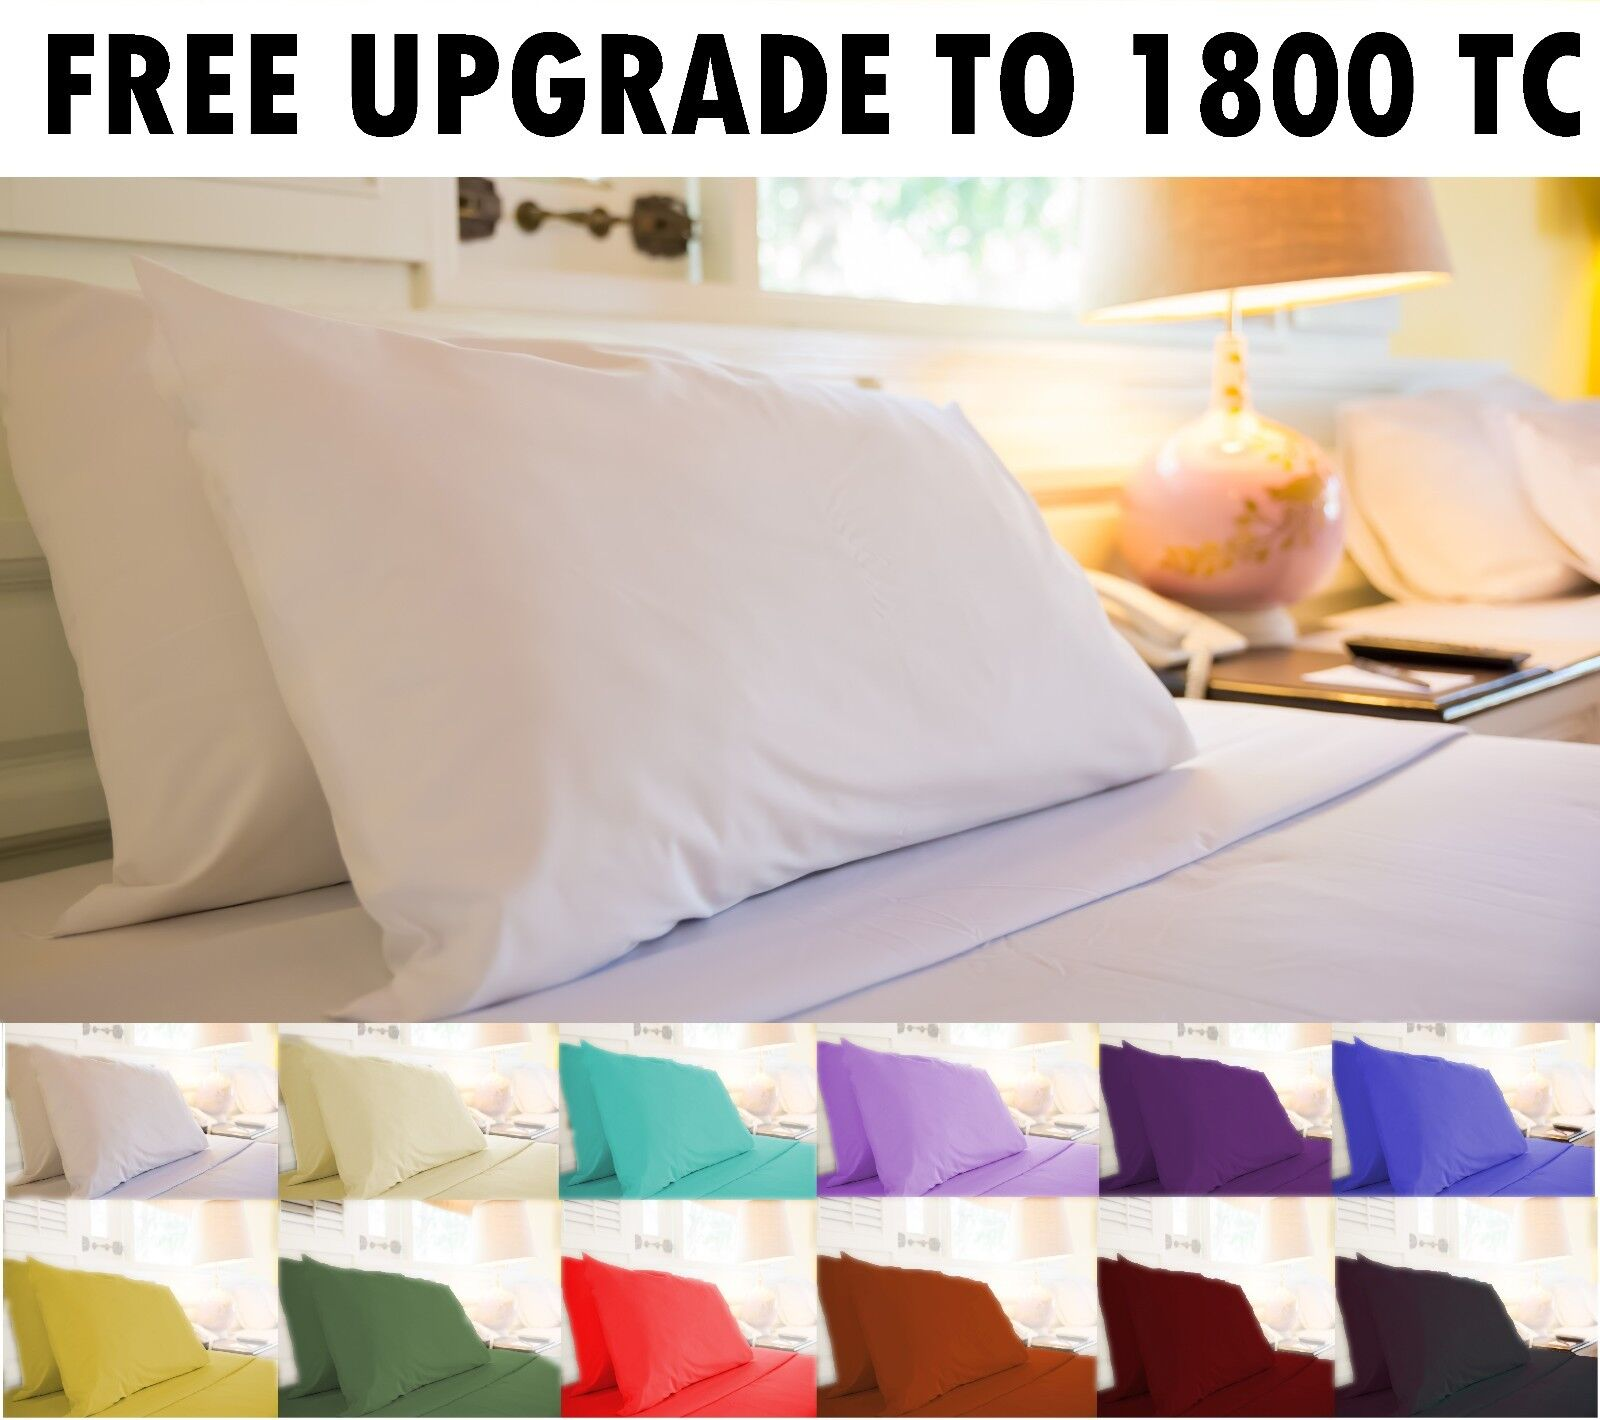 cotton sheet sets queen thread count 100 egyptian cotton 4 piece bed sheet set fits deep pockets - 100 Egyptian Cotton Sheets